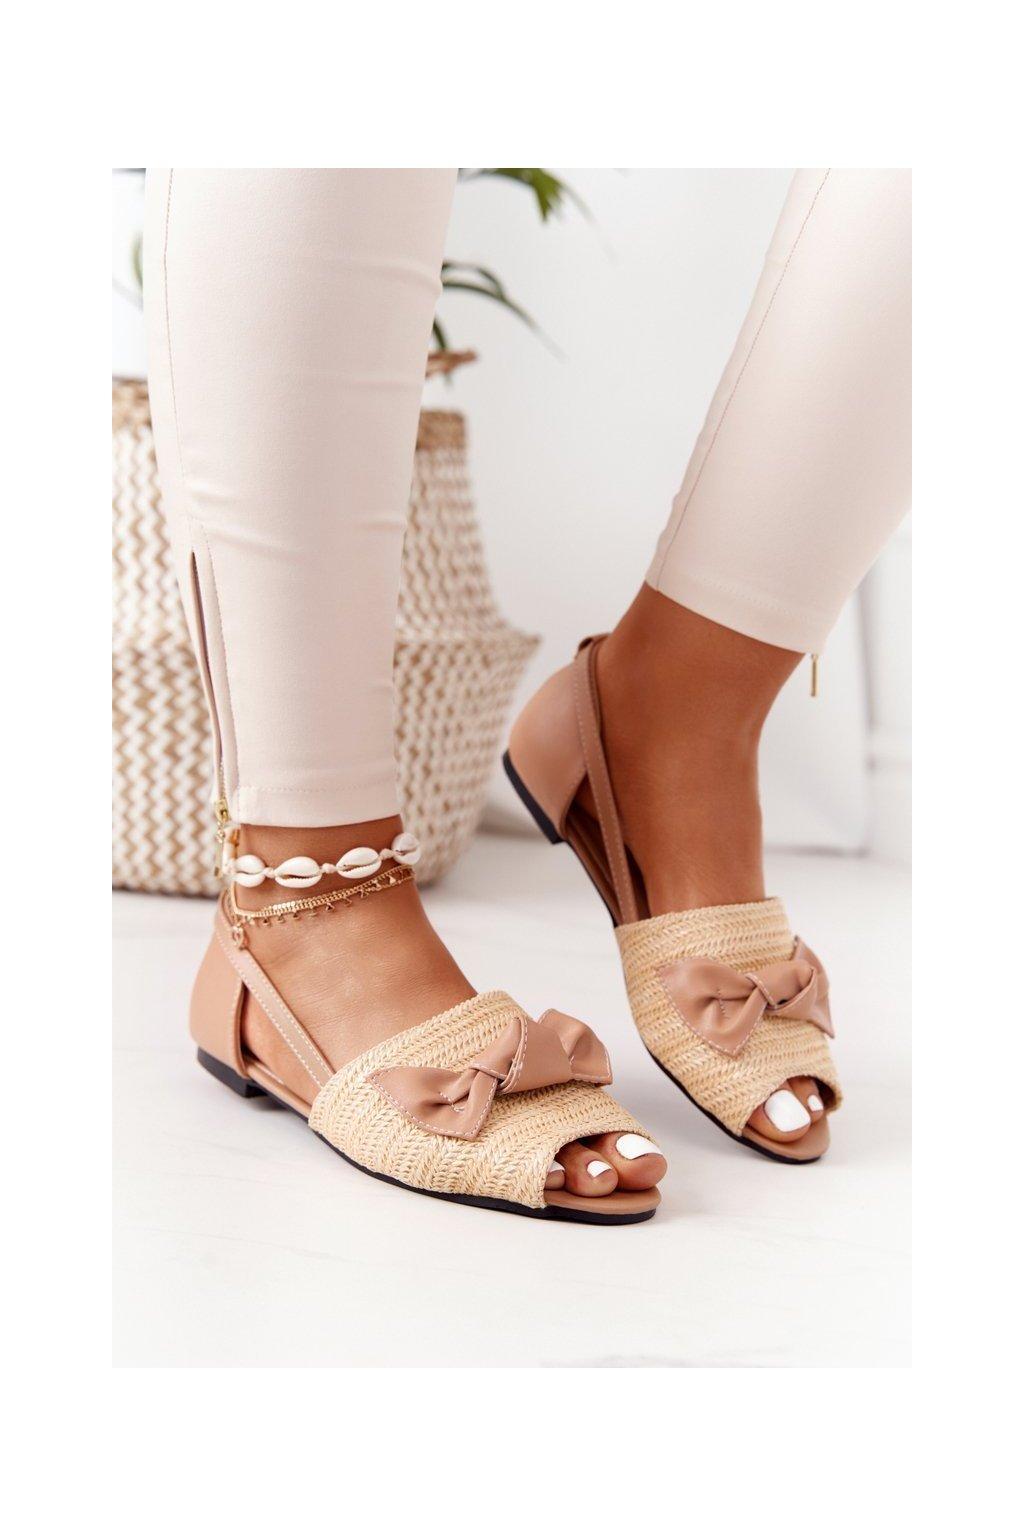 Dámske sandále farba hnedá NJSK 669-50 APRICOT